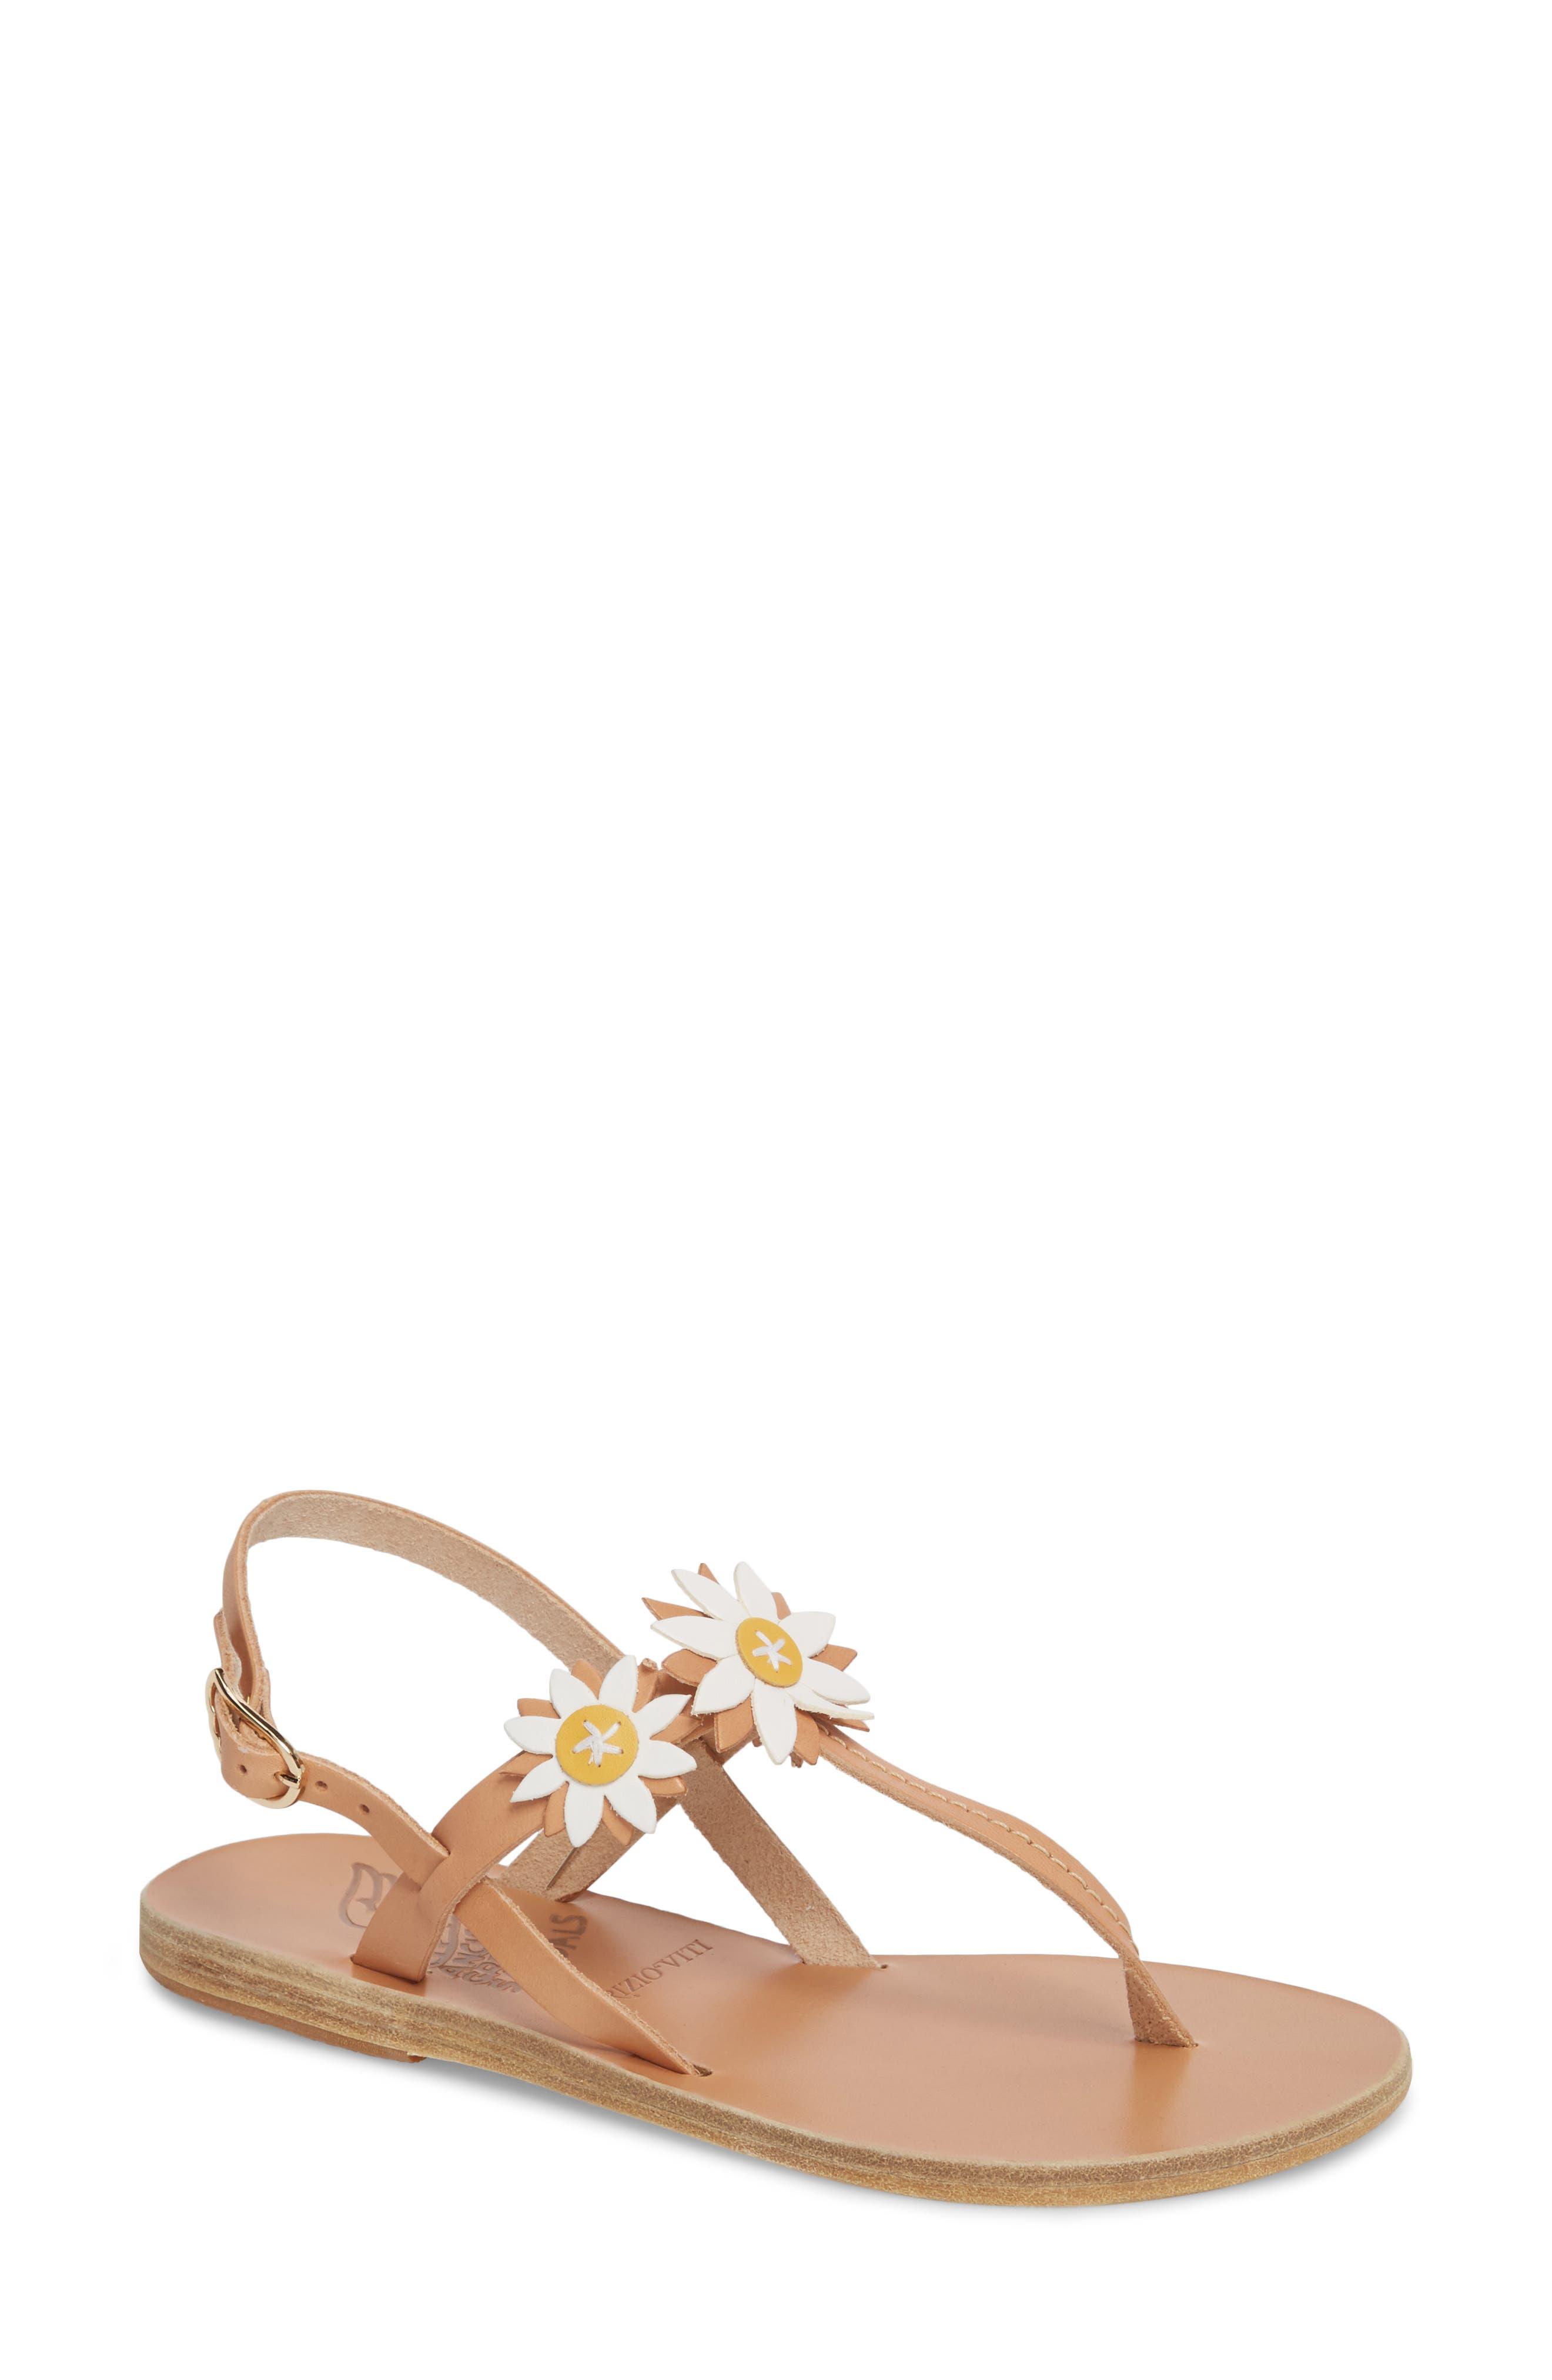 Main Image - Ancient Greek Sandals Sylvie Sandal (Women)